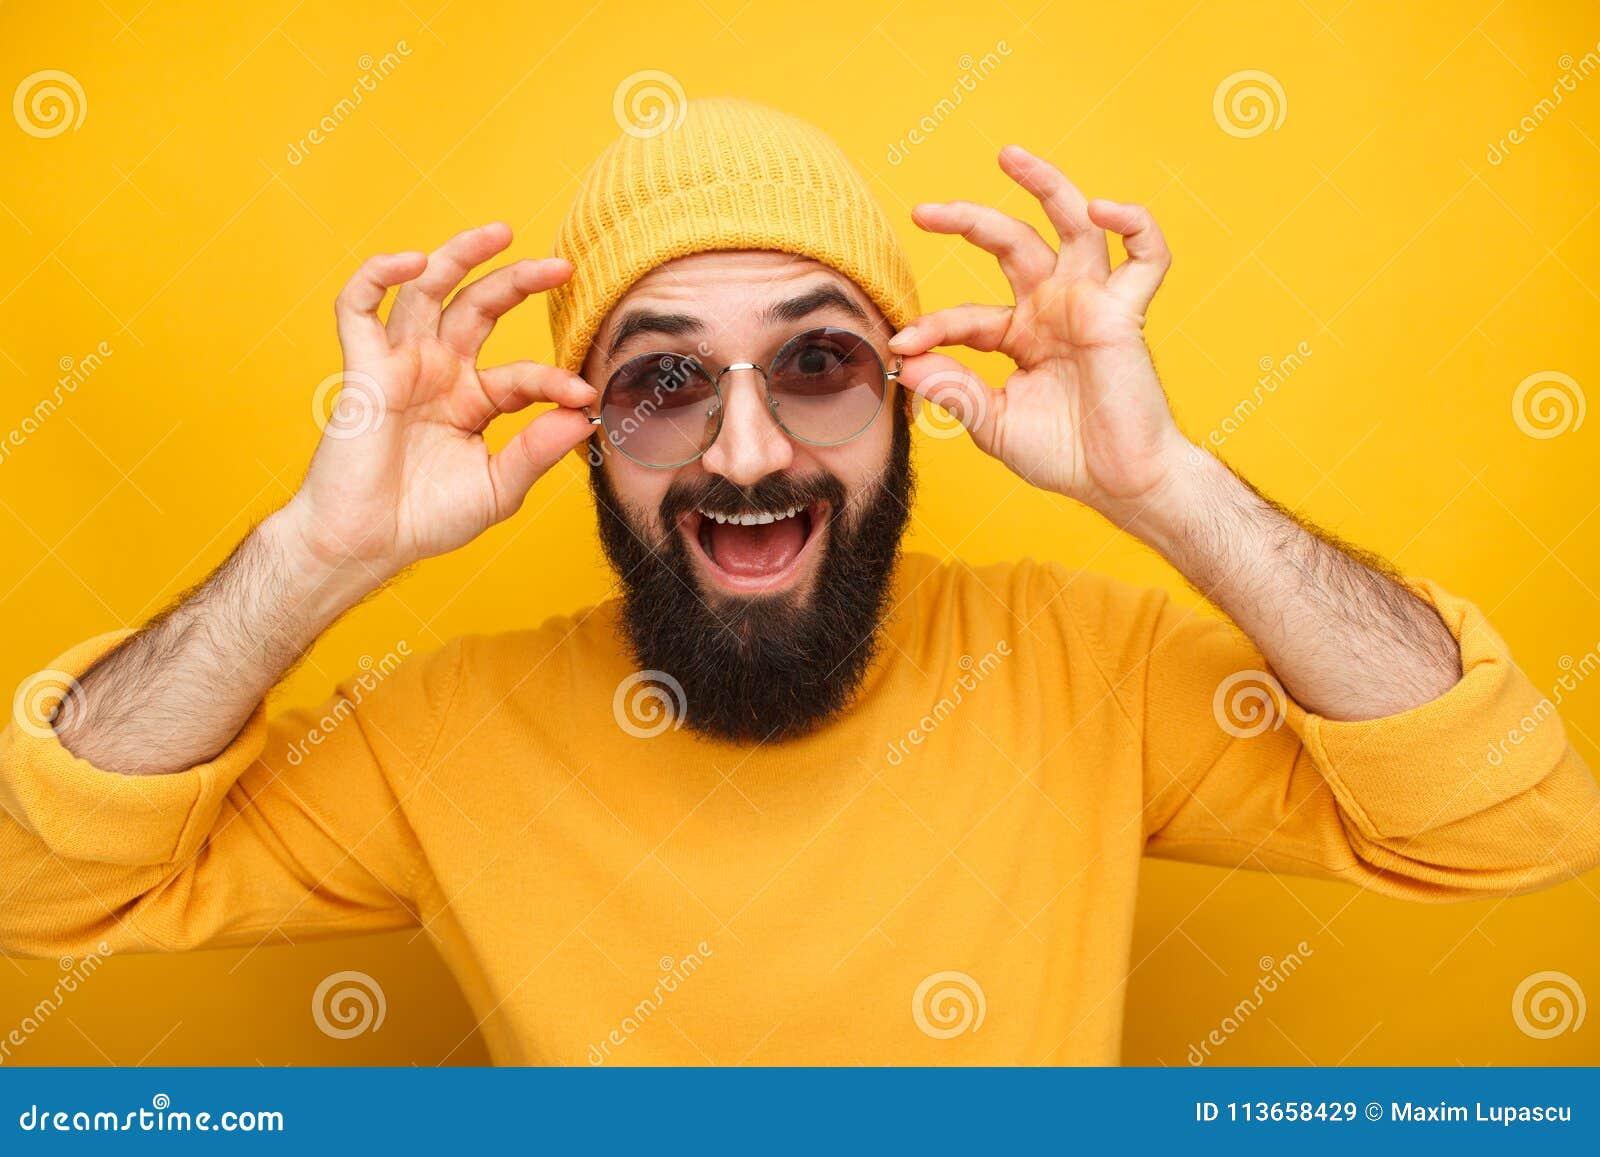 Bassa Sole Pantaloni Da Allegri Dei Vita Di A Prova Occhiali eEWrCxBoQd